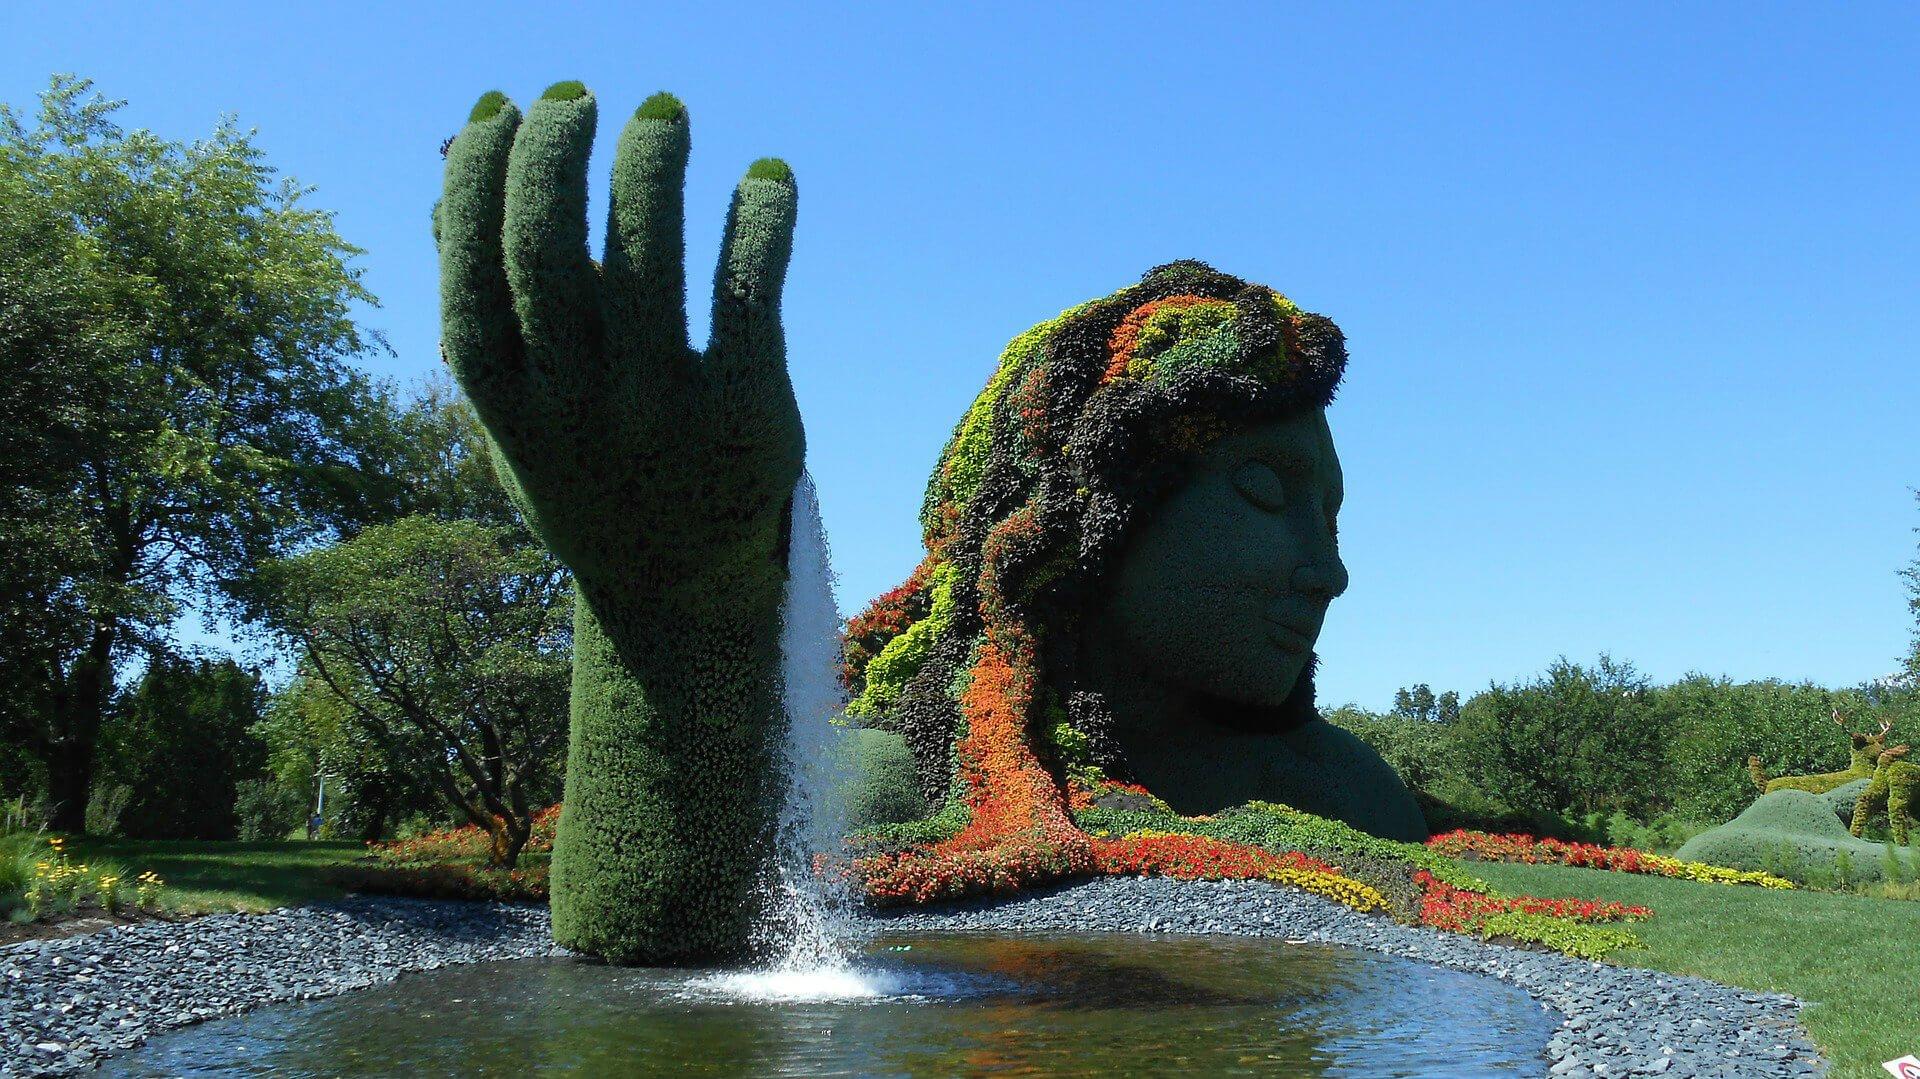 jardin flower garden with waterfall